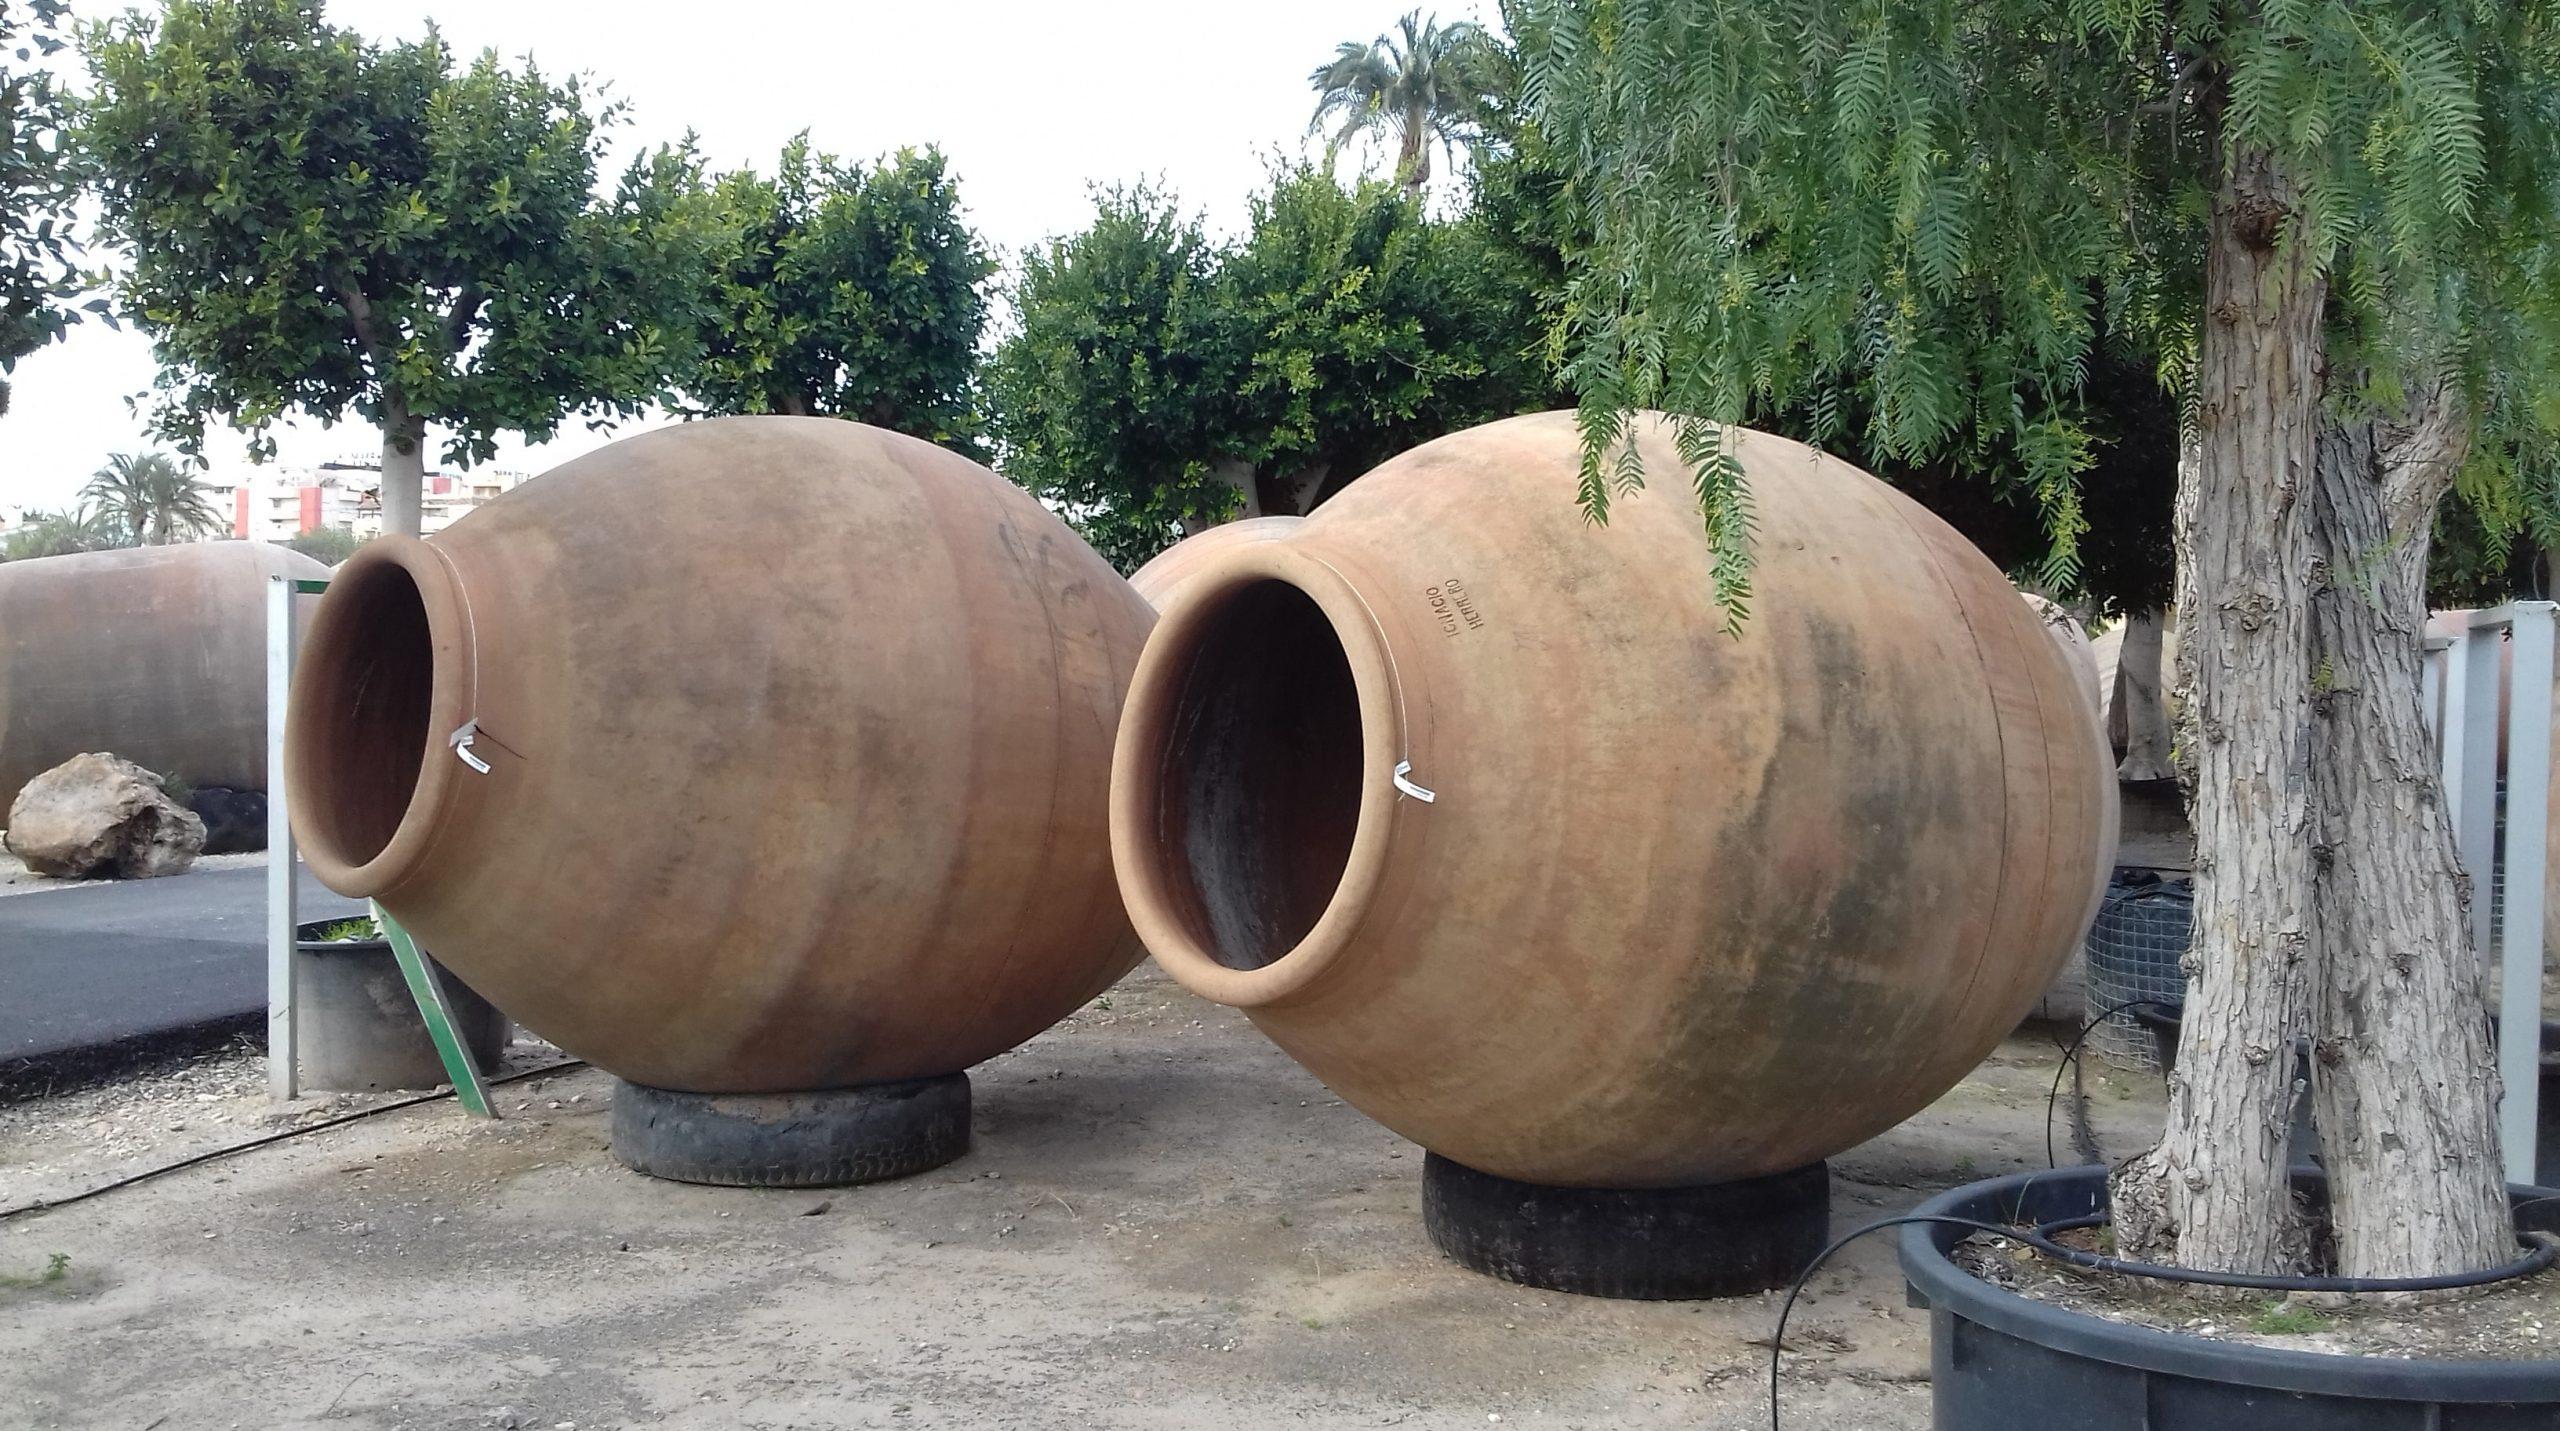 Les Amphores Jardin - Viveros Valero E Hijos Sl encequiconcerne Amphore De Jardin